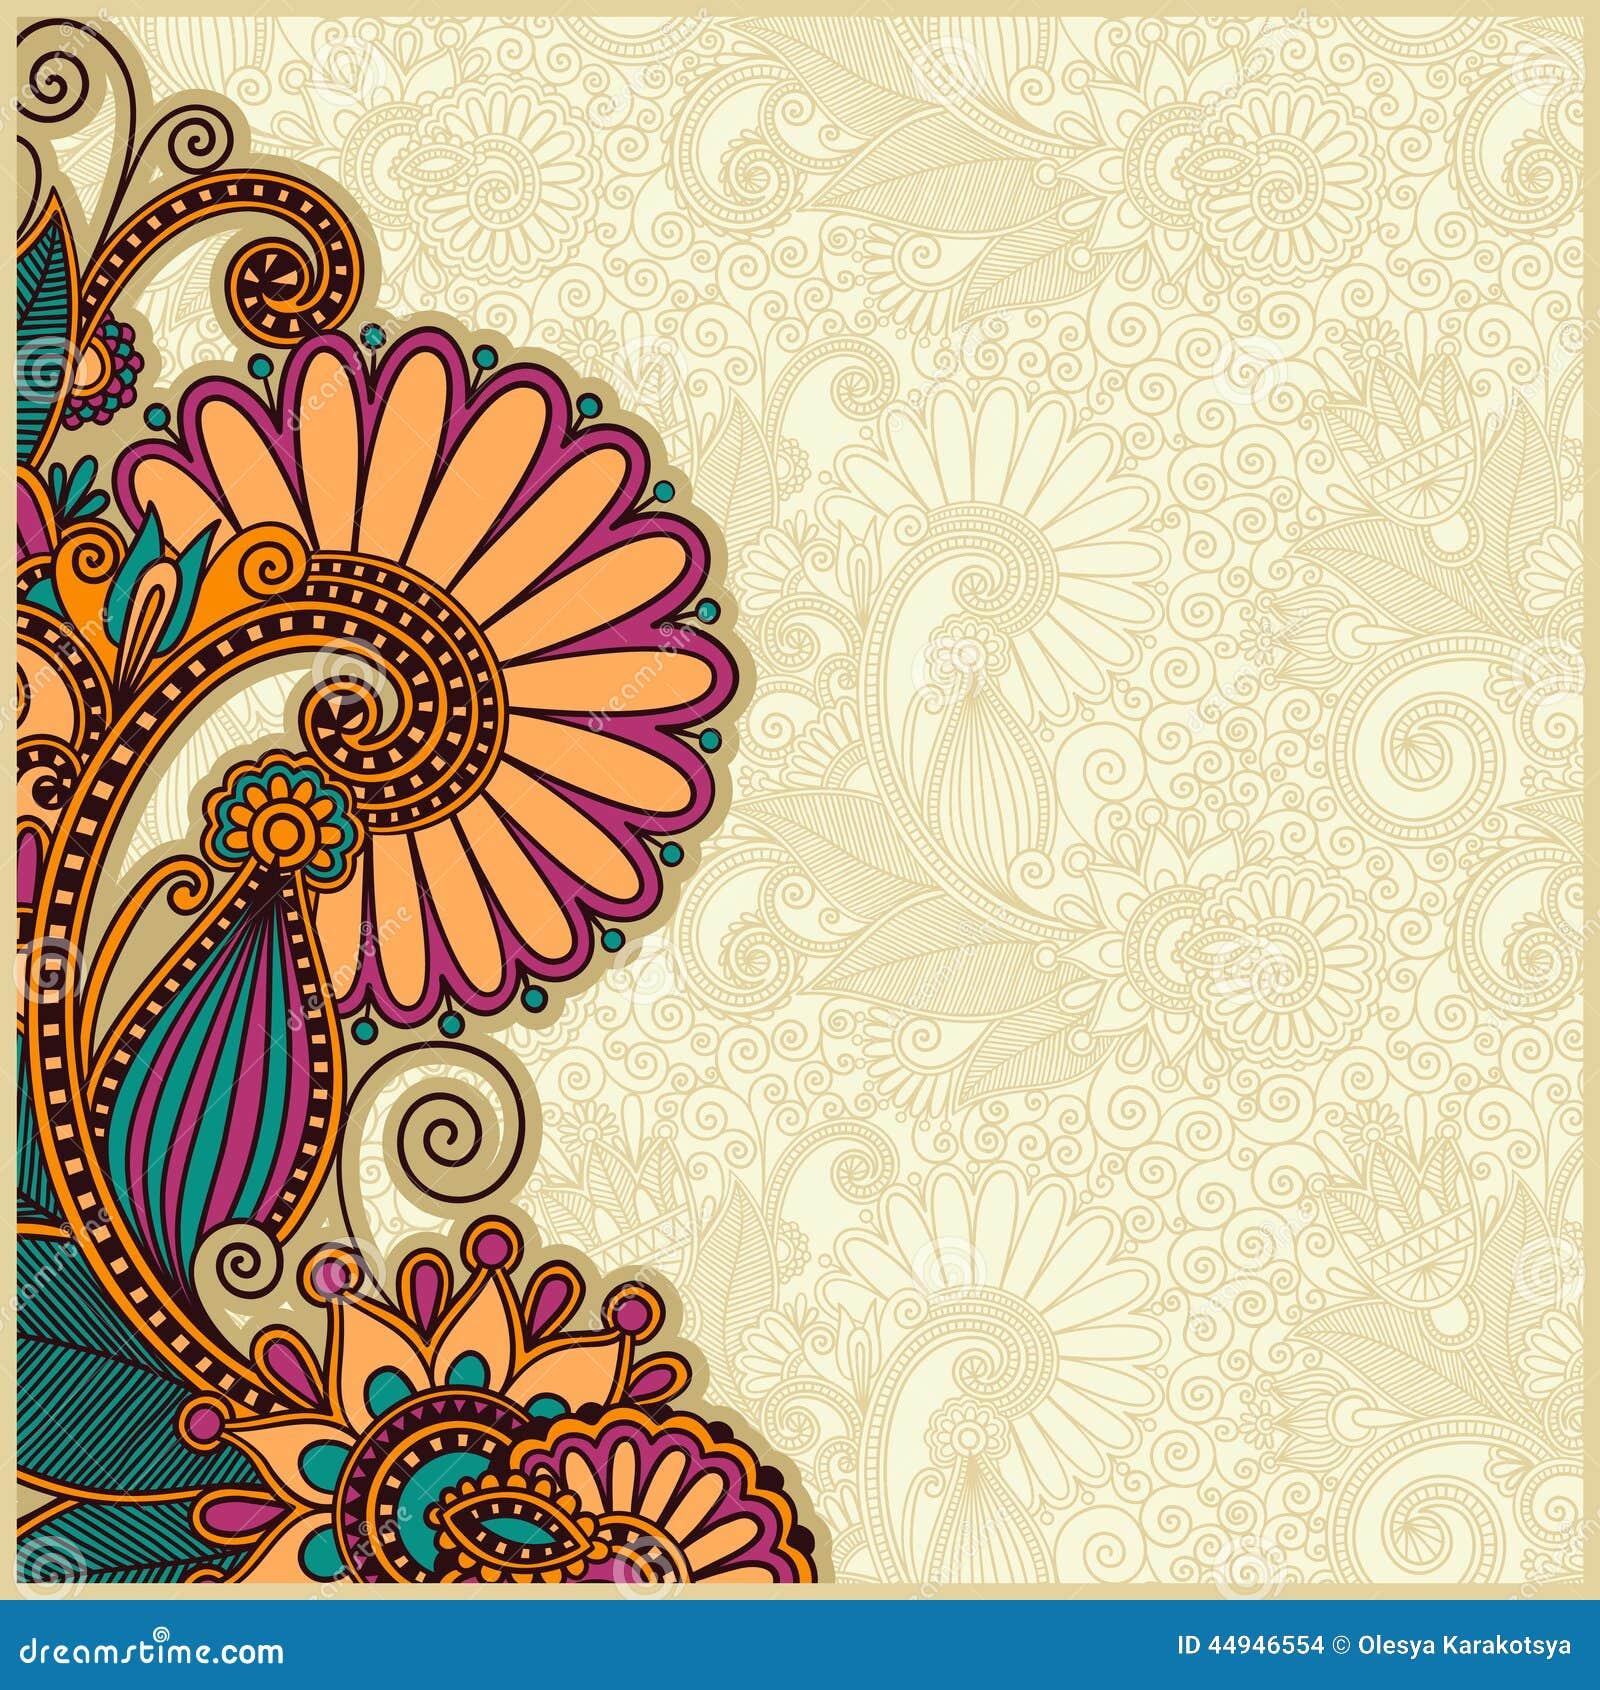 flower background design stock vector illustration of corporate